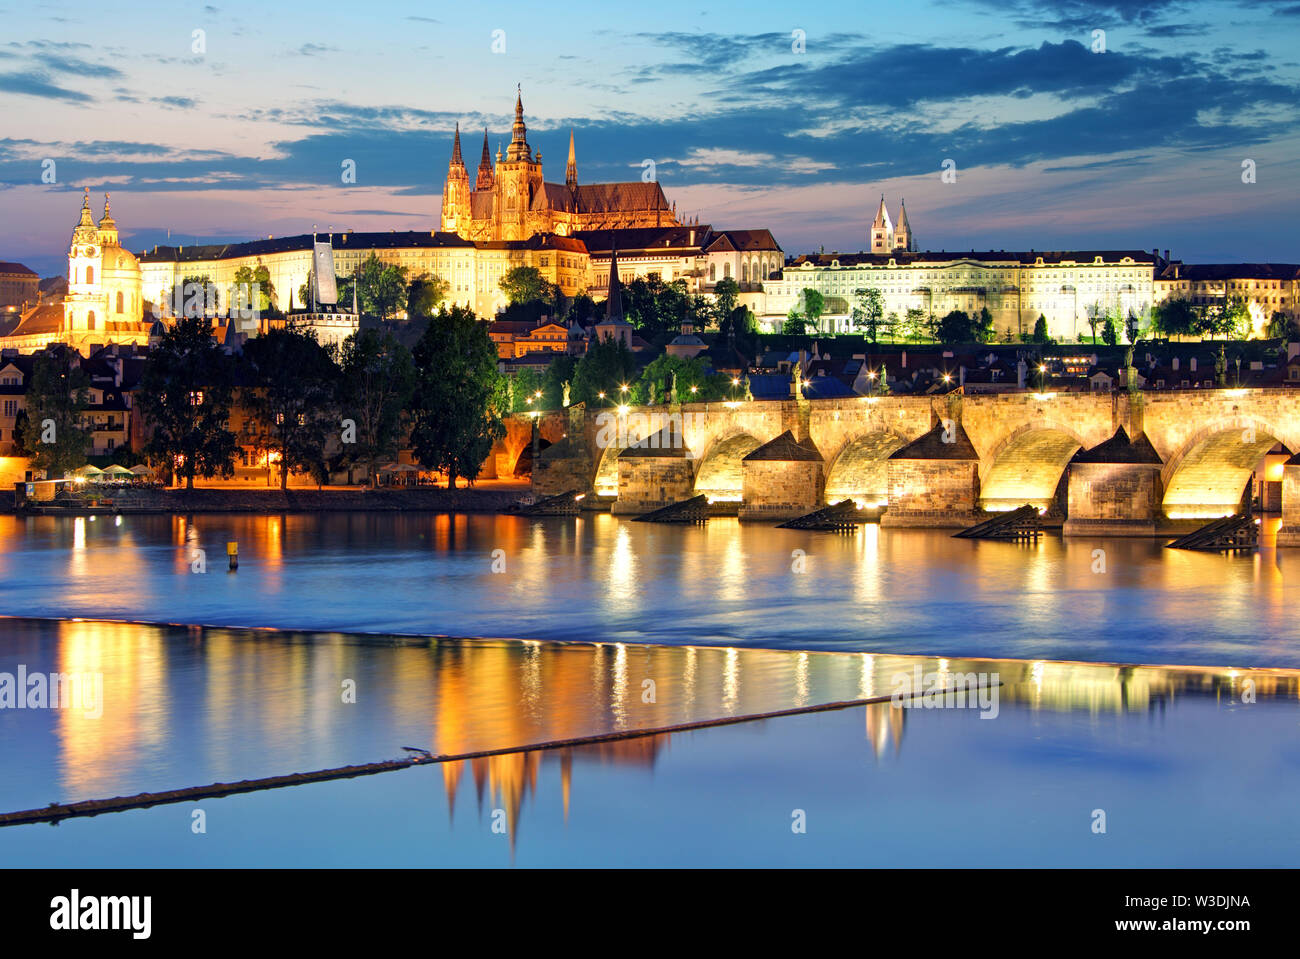 Prague castle and Charles bridge at night Stock Photo